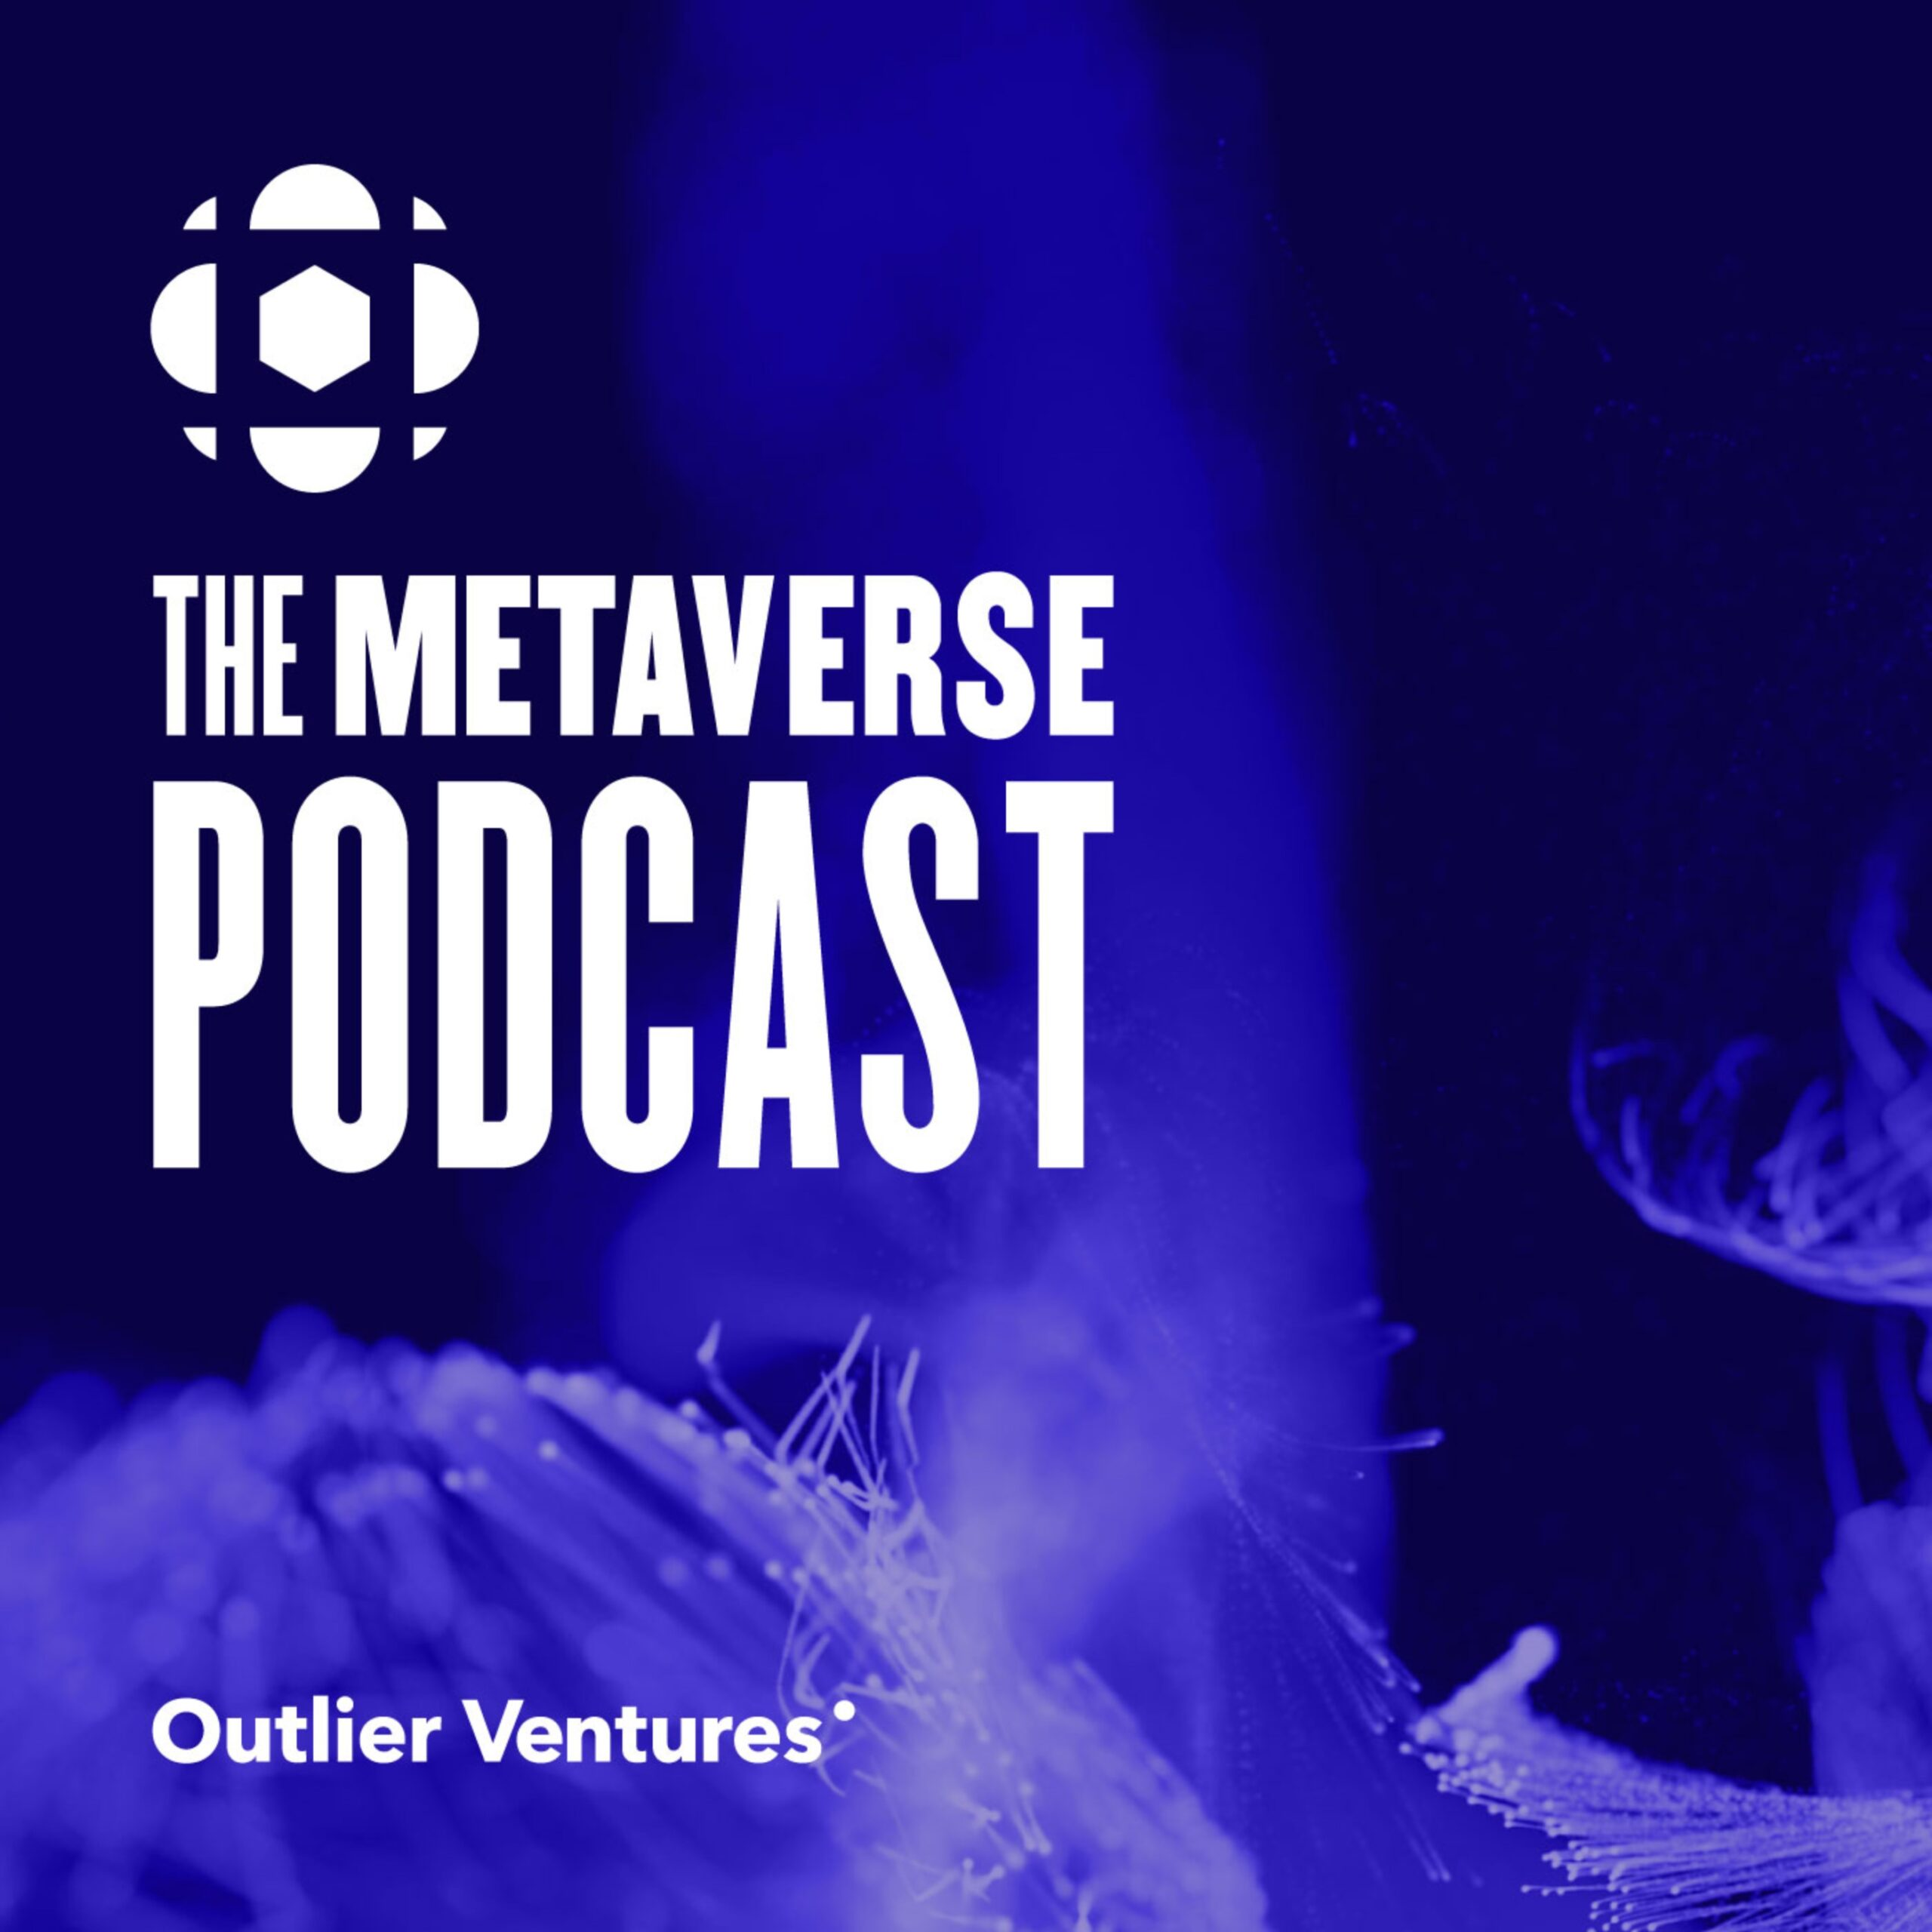 the-metaverse-podcast-thumbnail_b7gyz8